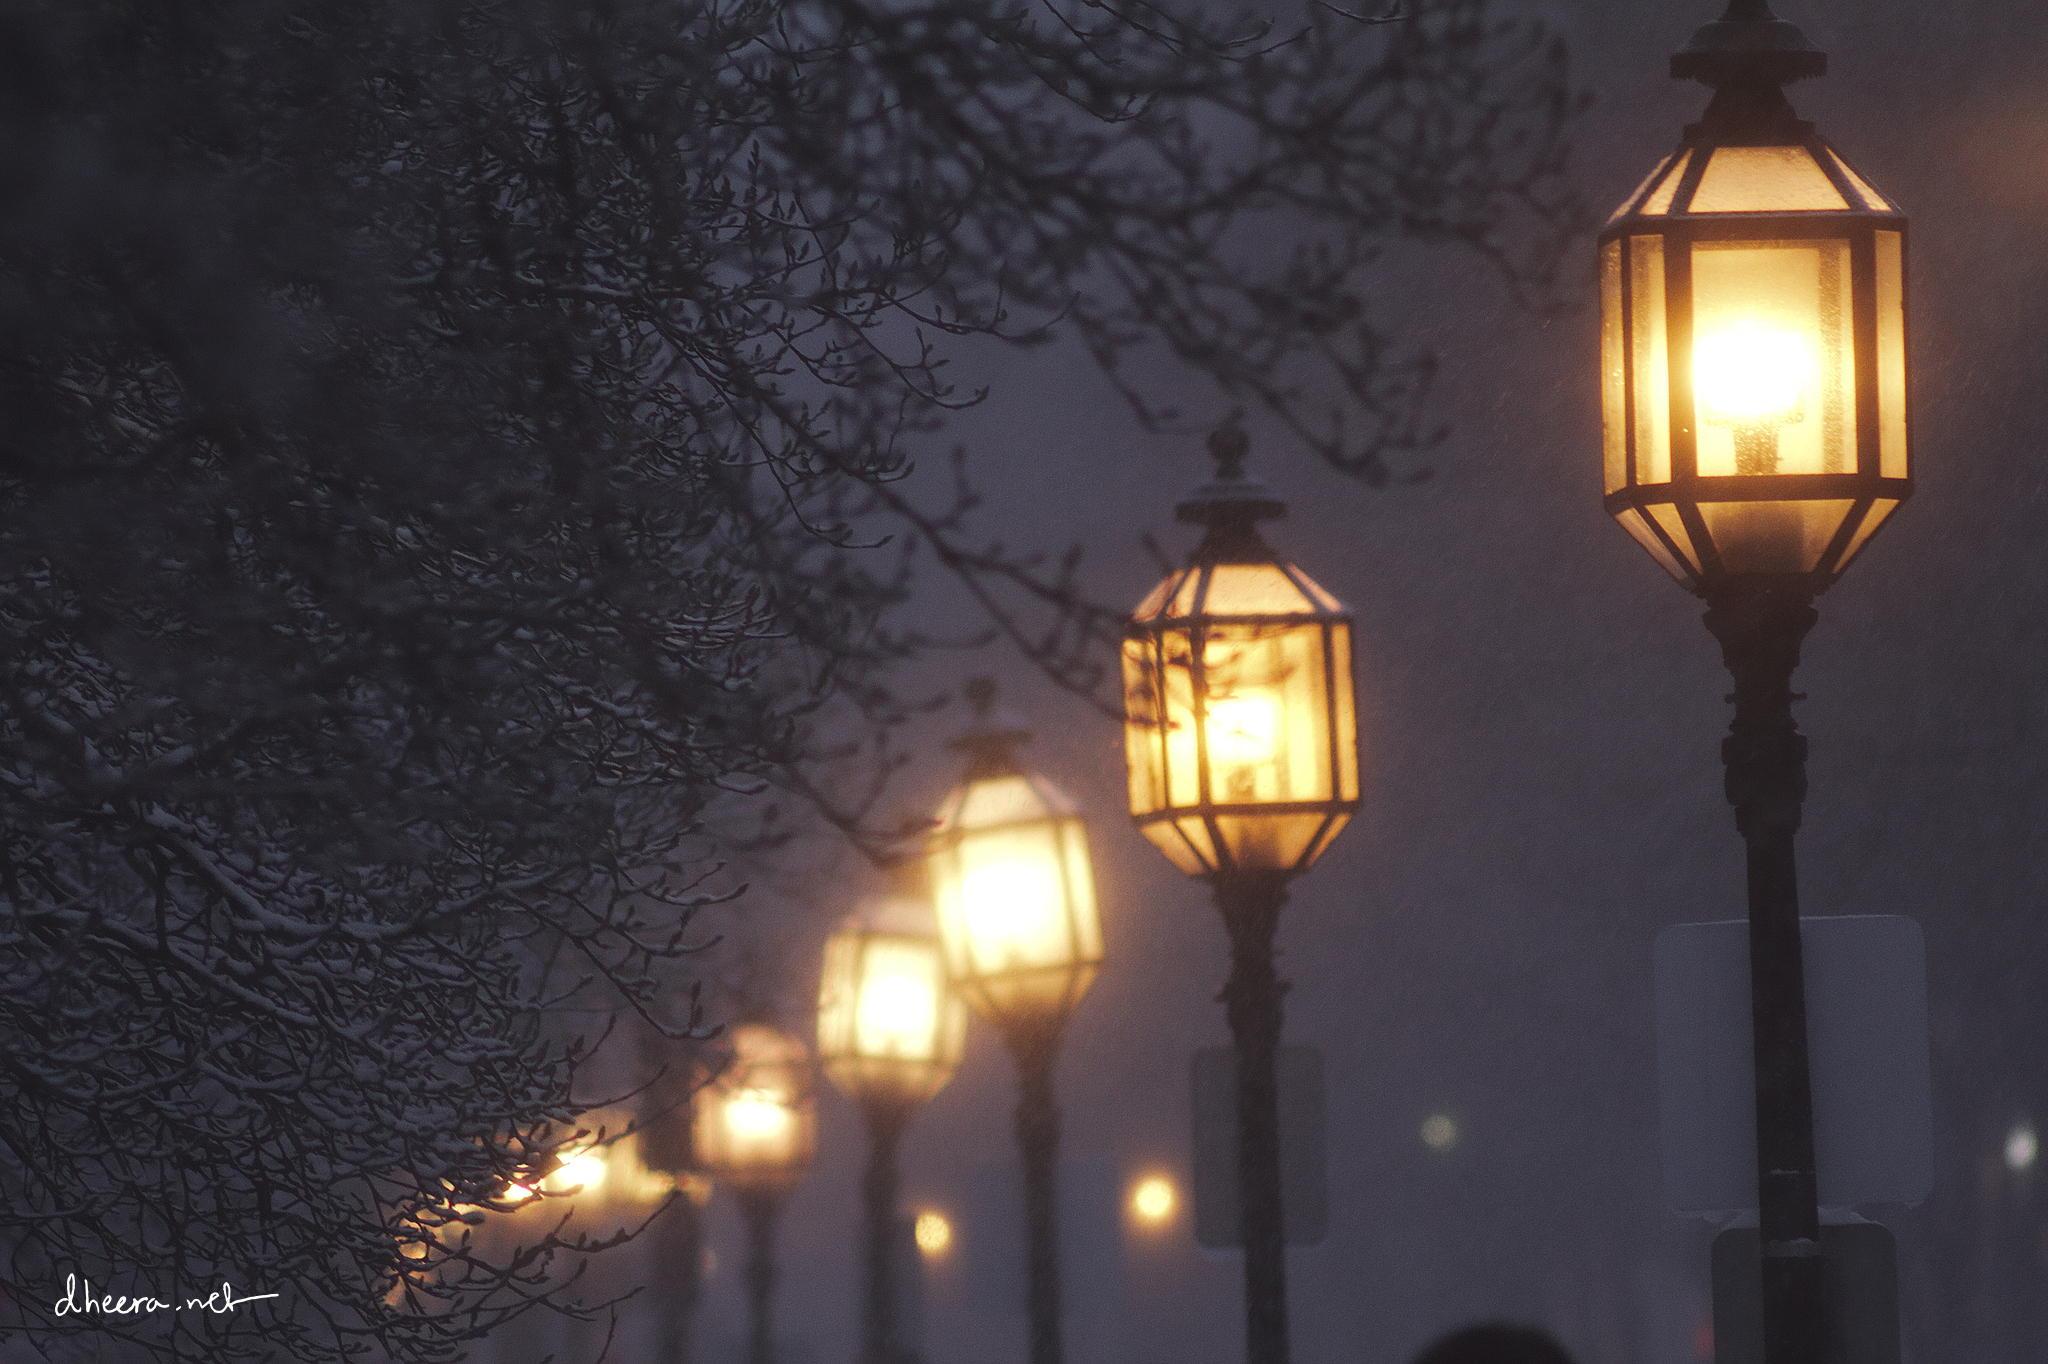 Комунальники лагодять світло в Ужгороді